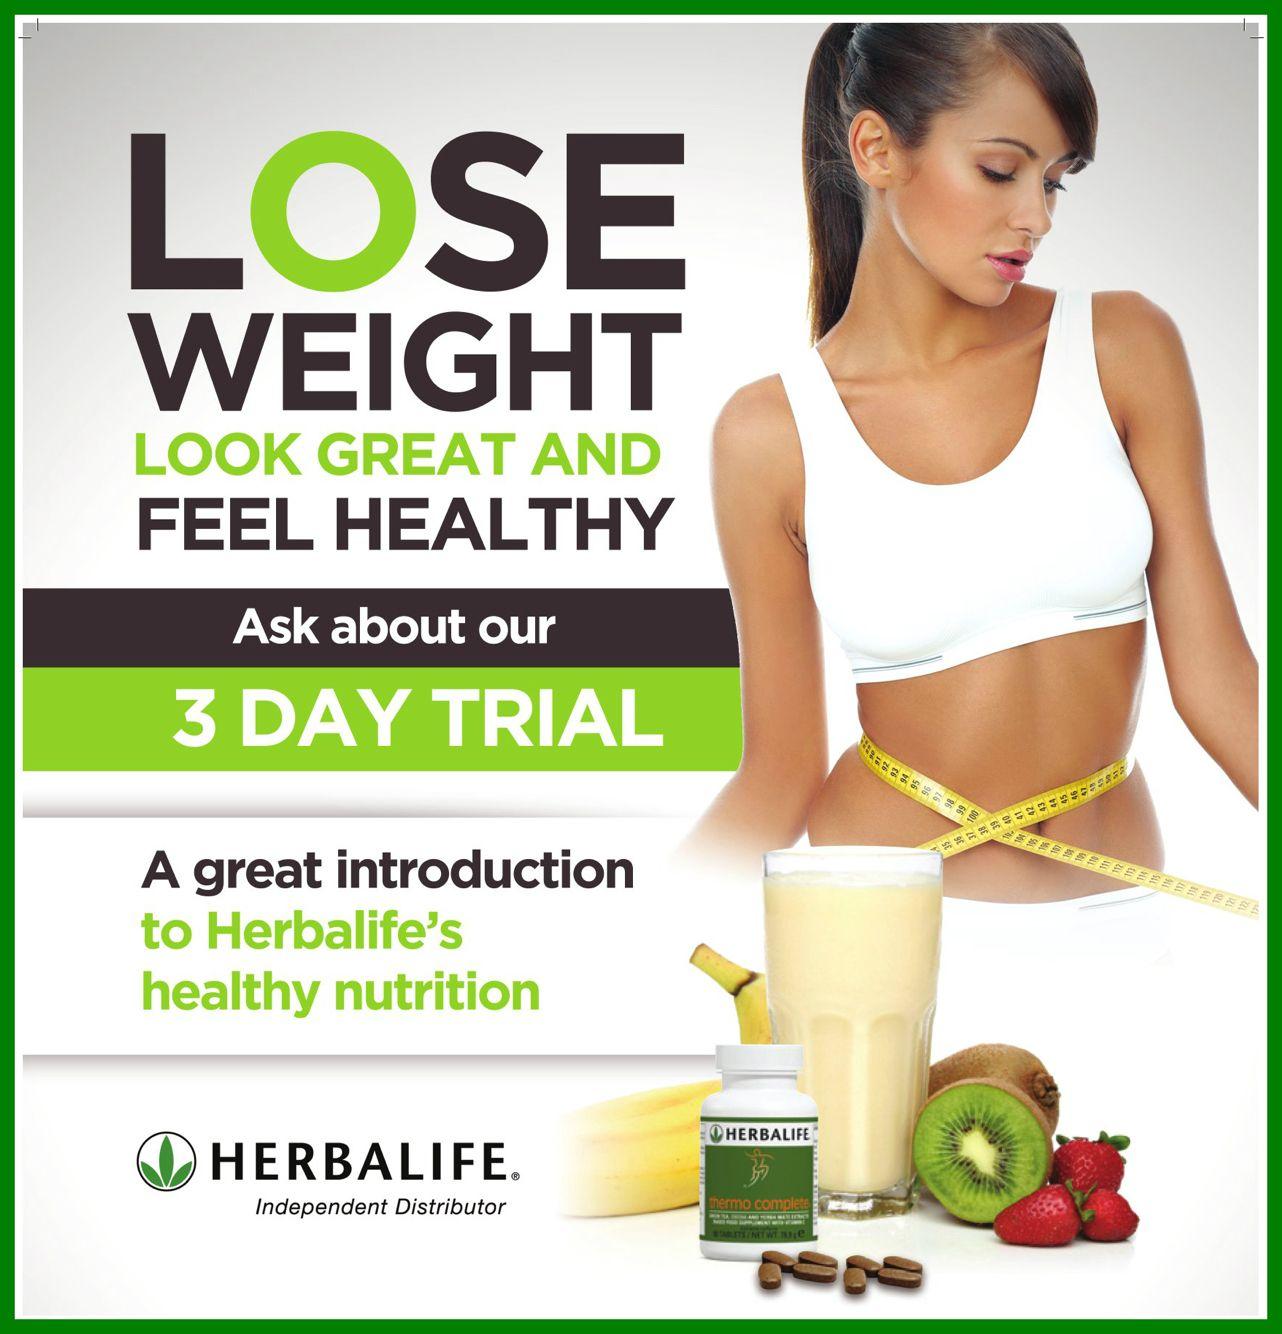 Weight loss juicing photo 9